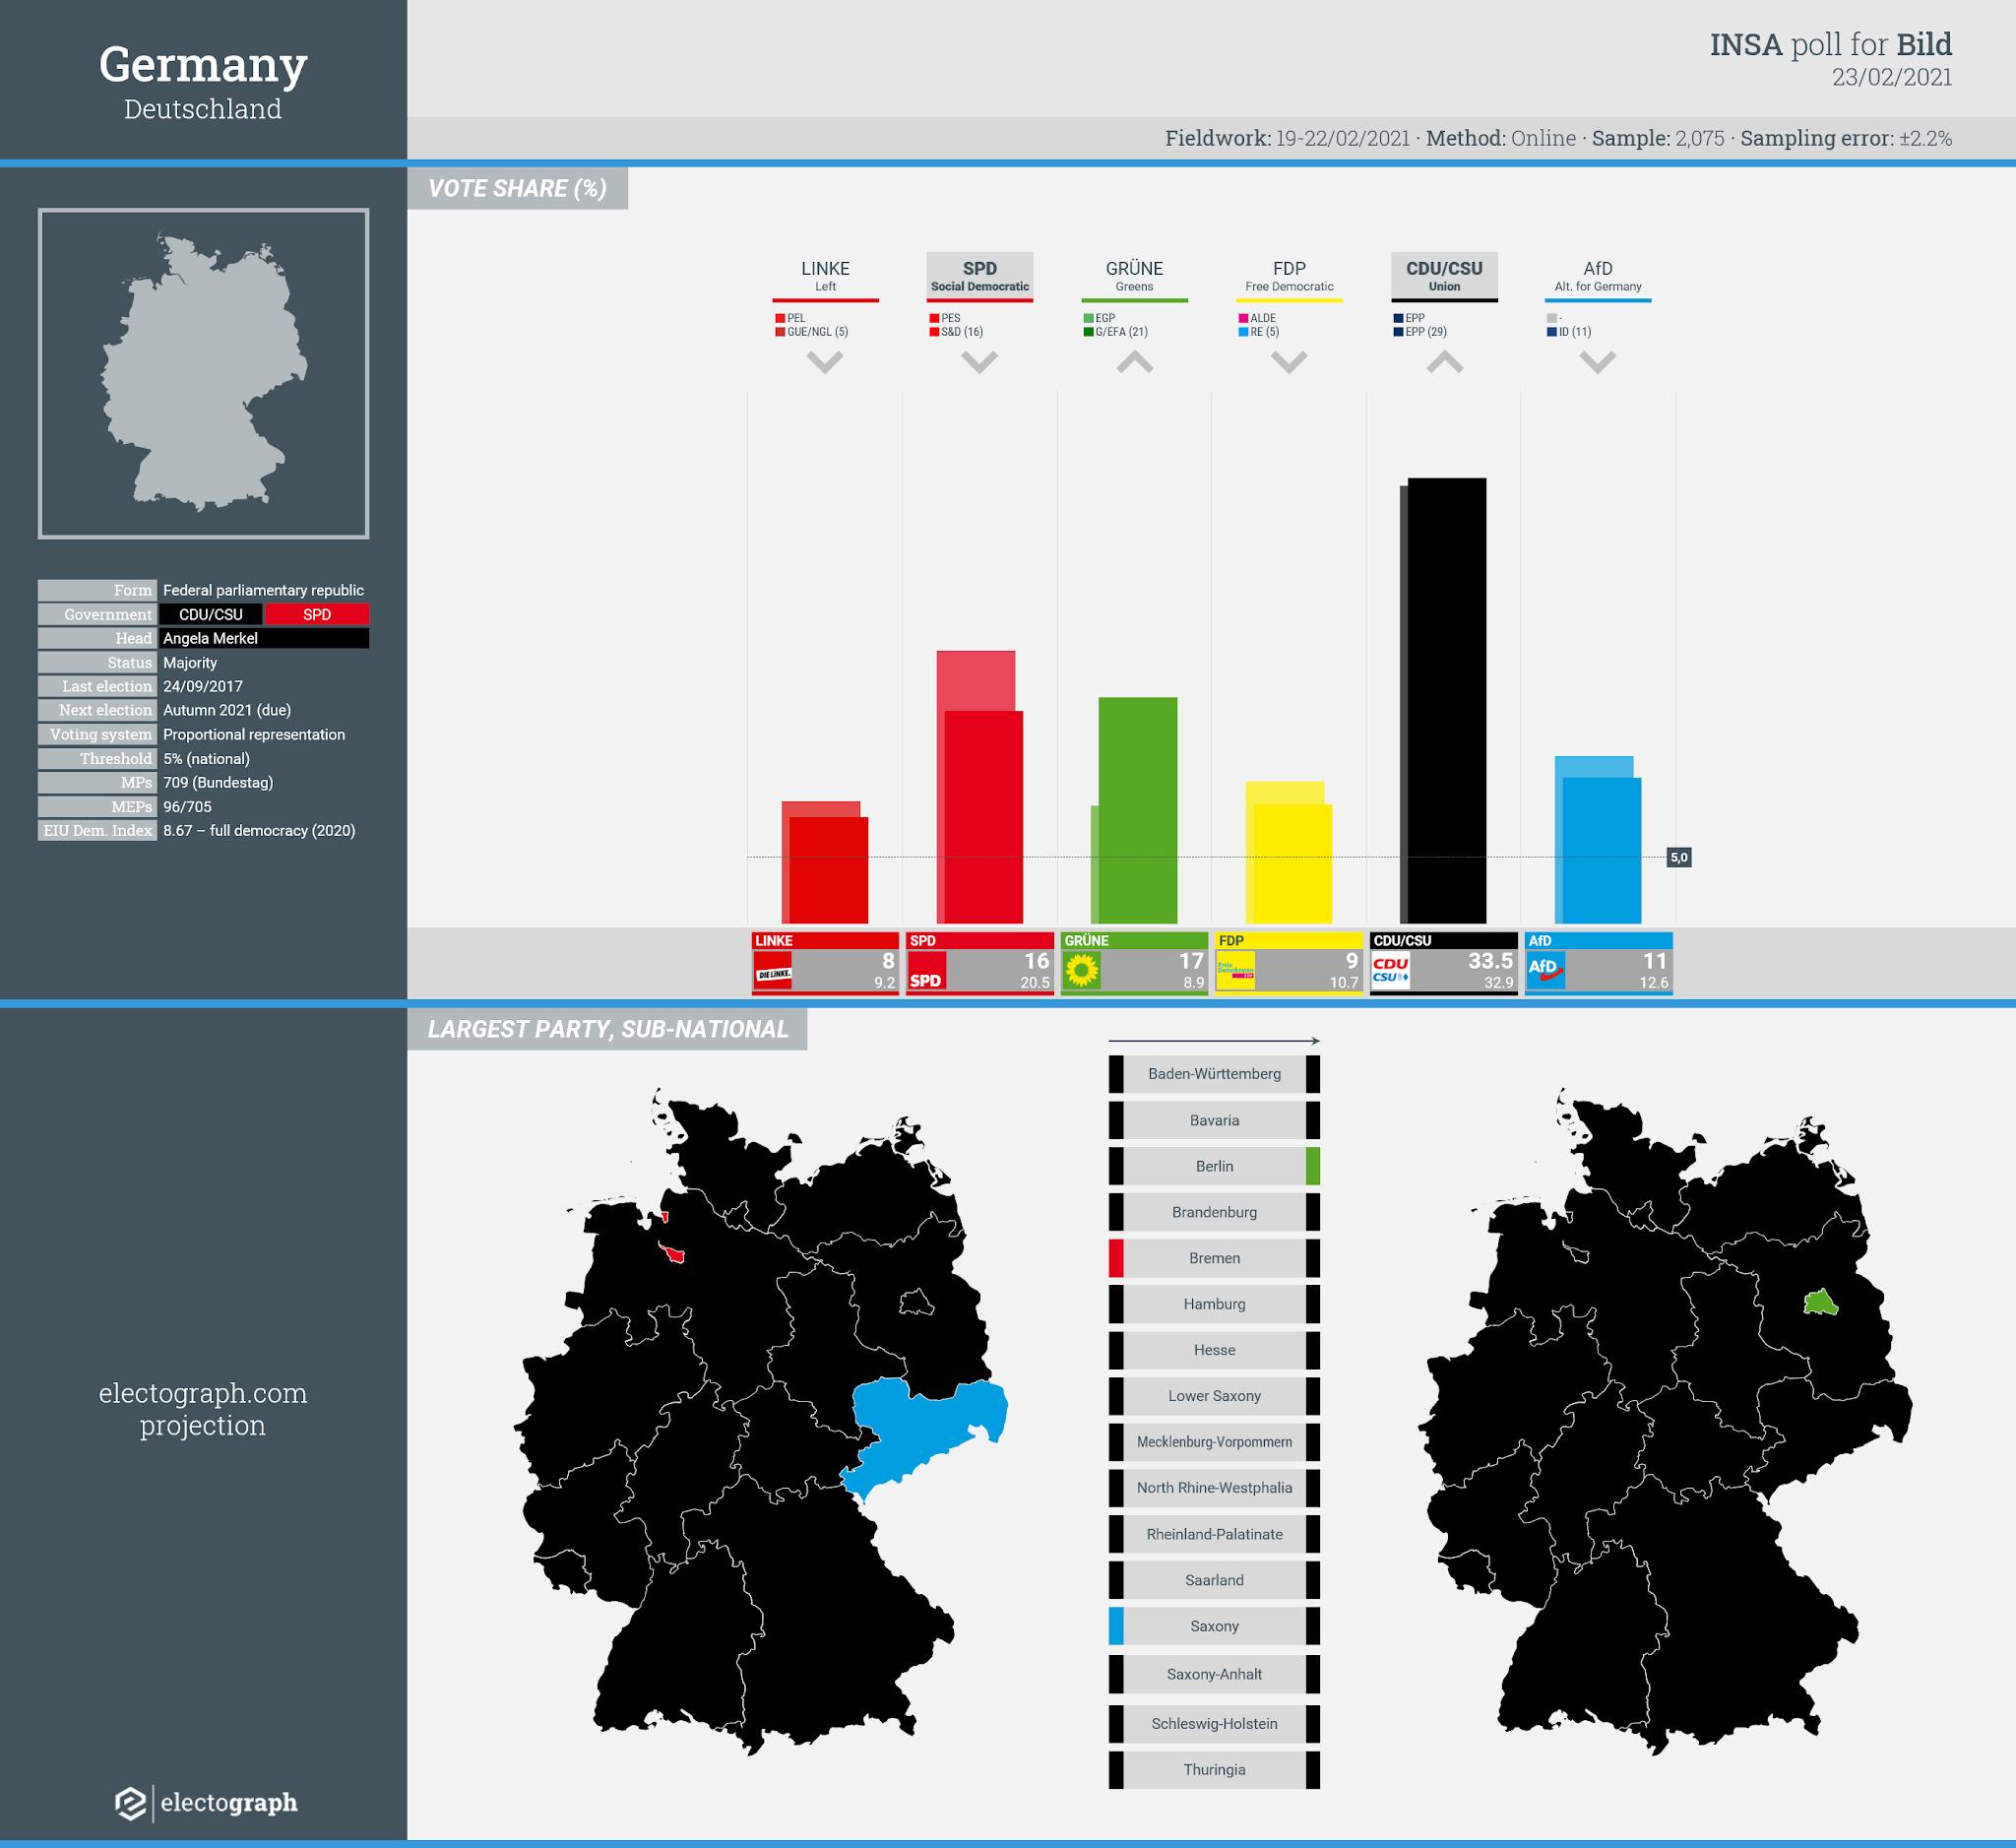 GERMANY: INSA poll chart for Bild, 23 February 2021